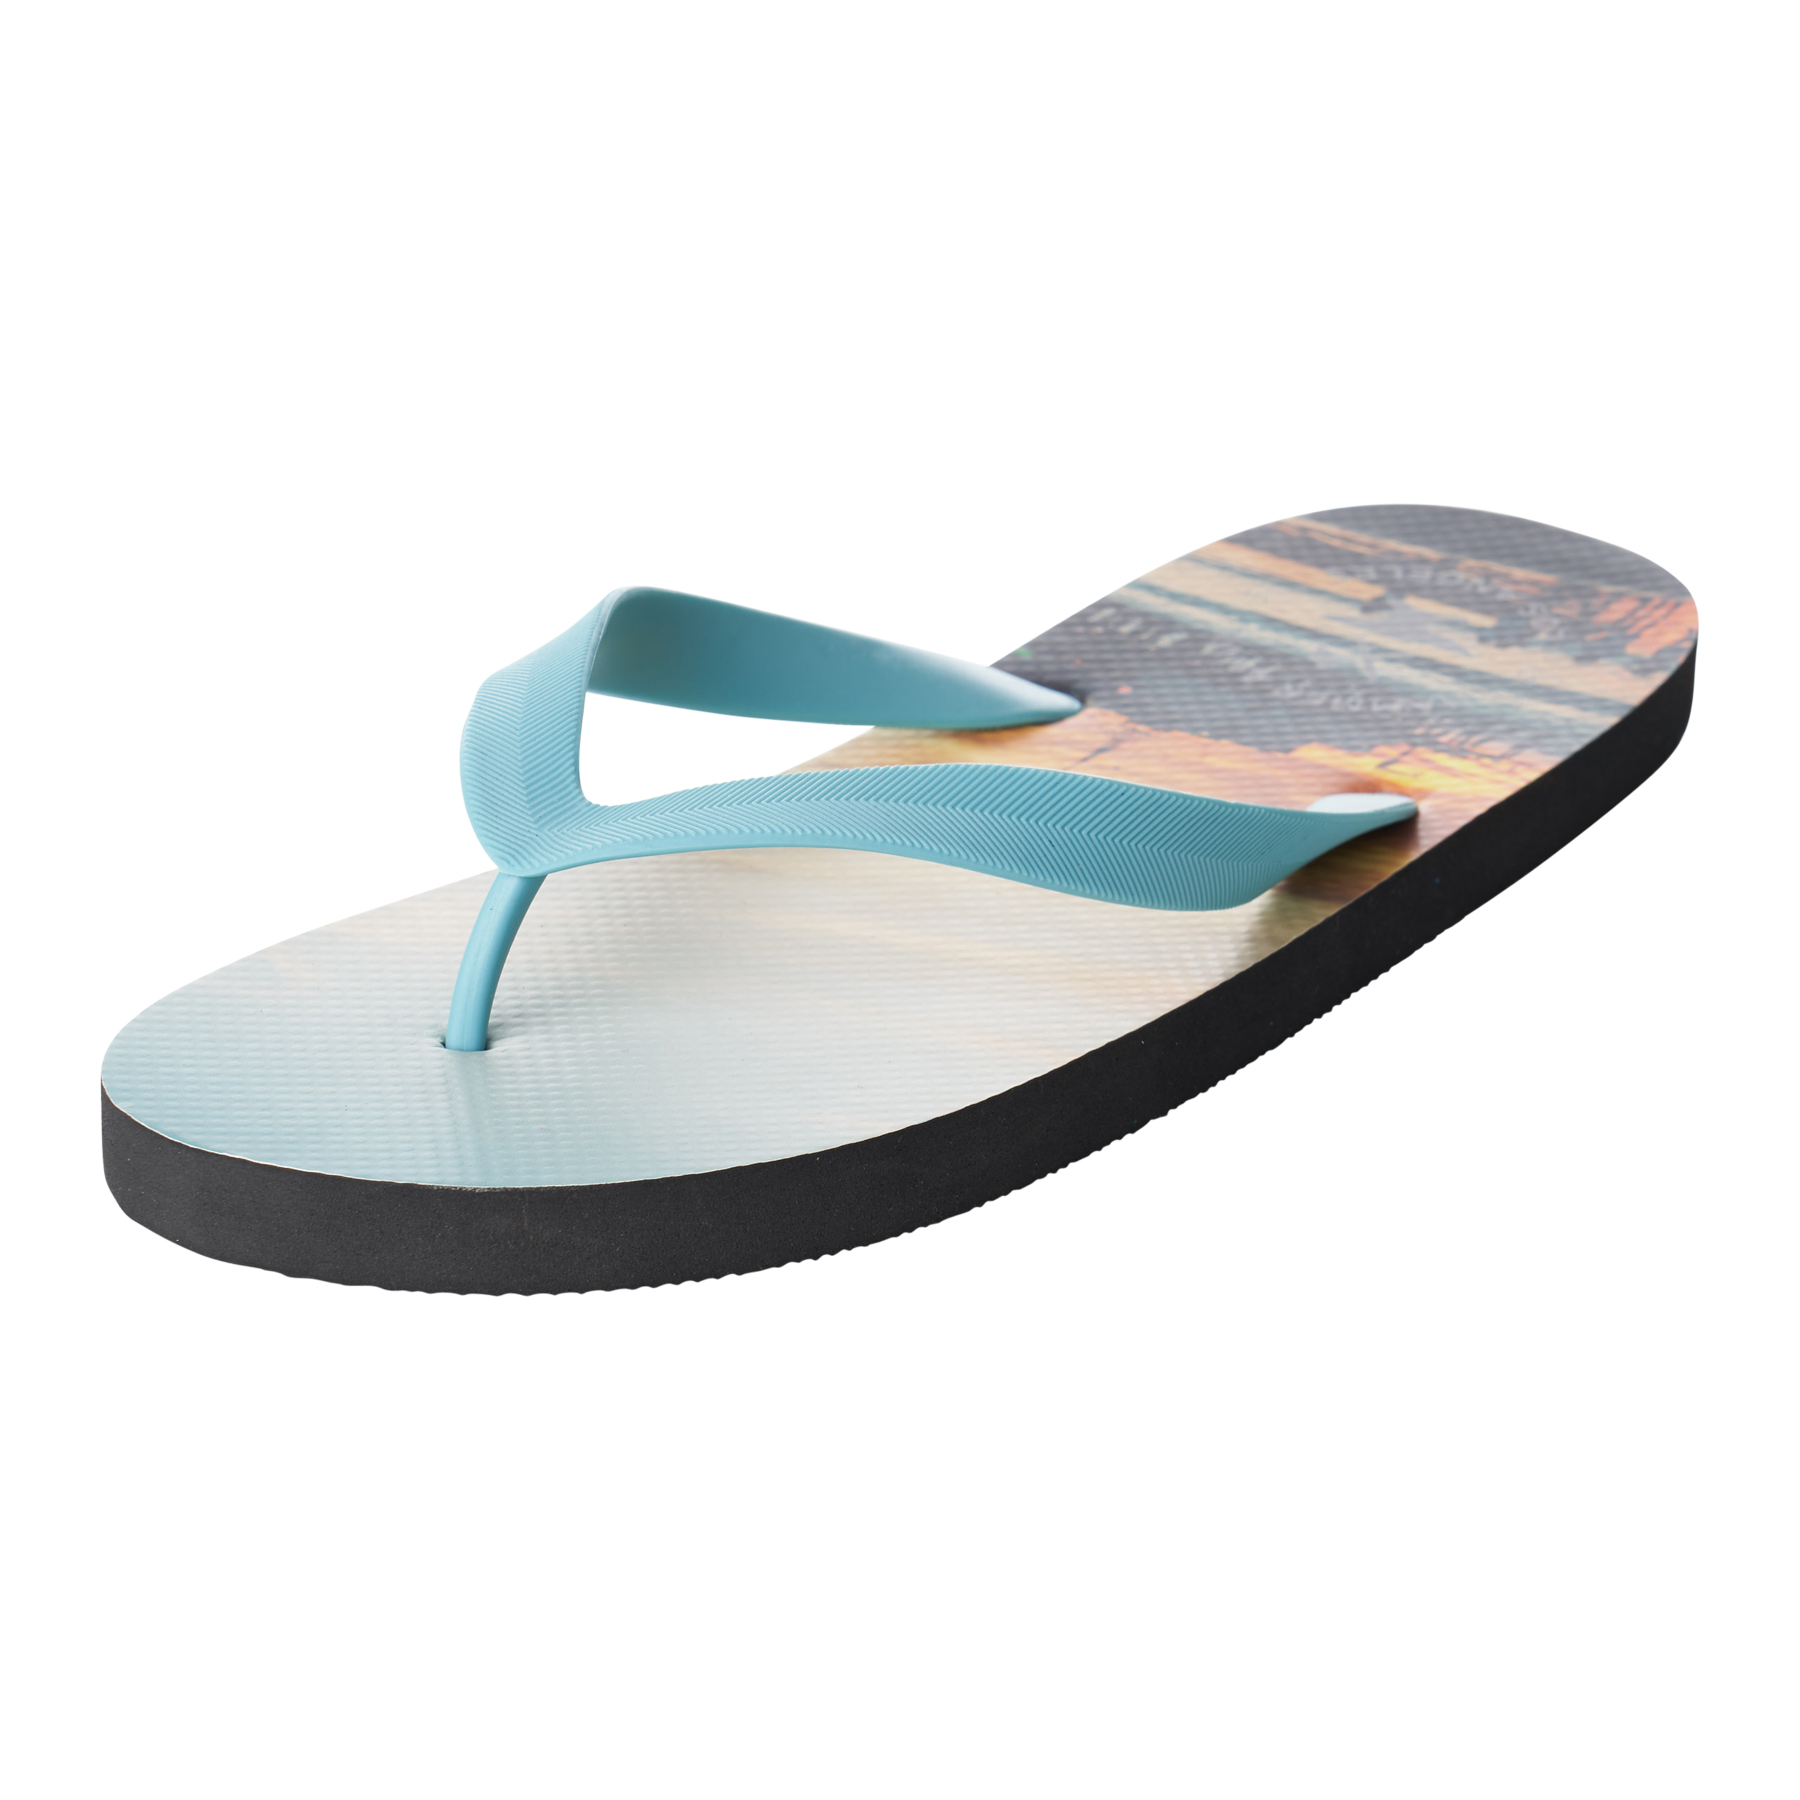 Hammer-Anvil-Mens-Flip-Flops-Casual-Thong-Summer-Sandals-Comfortable-Beach-Shoes thumbnail 24